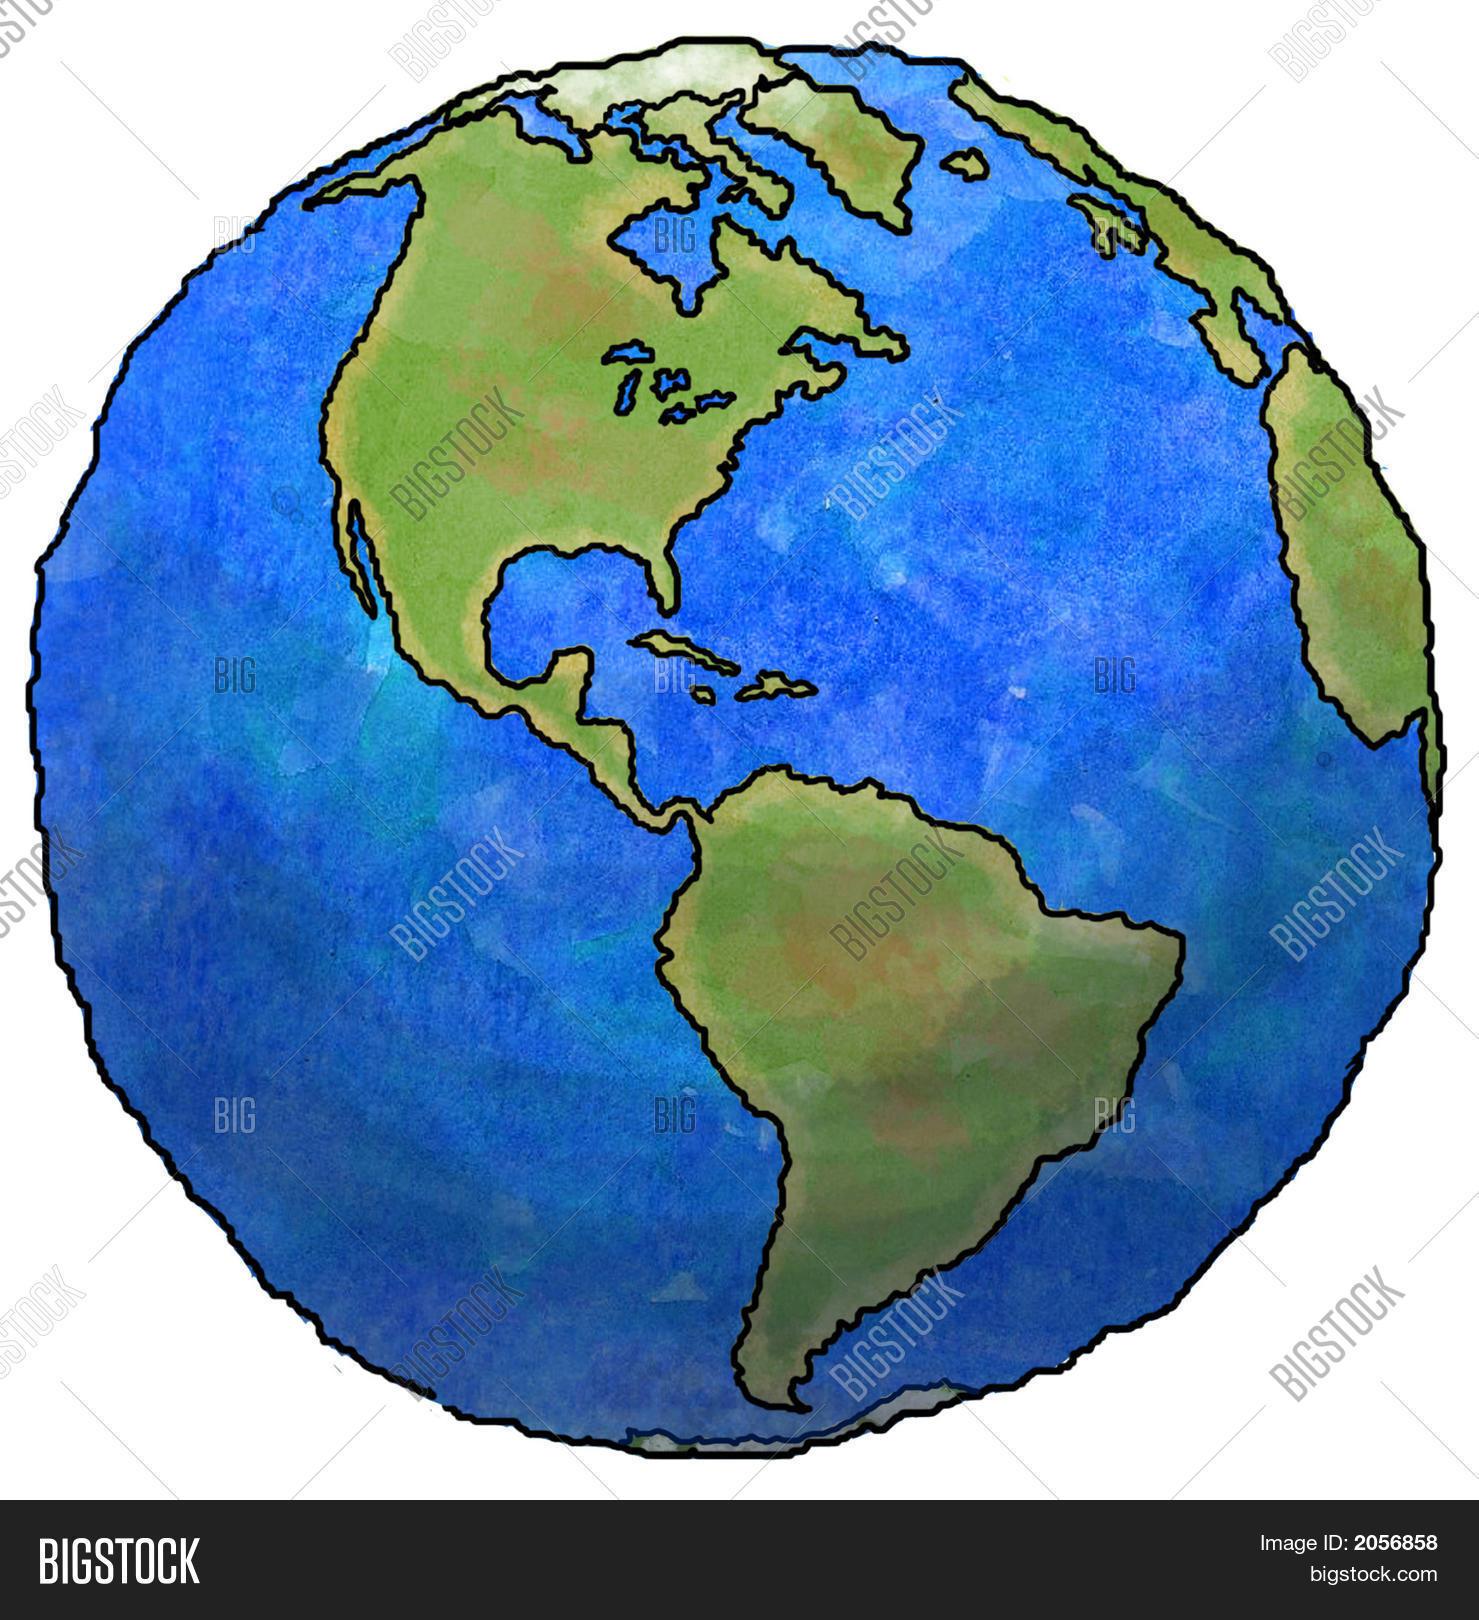 Planet Earth Image Amp Photo